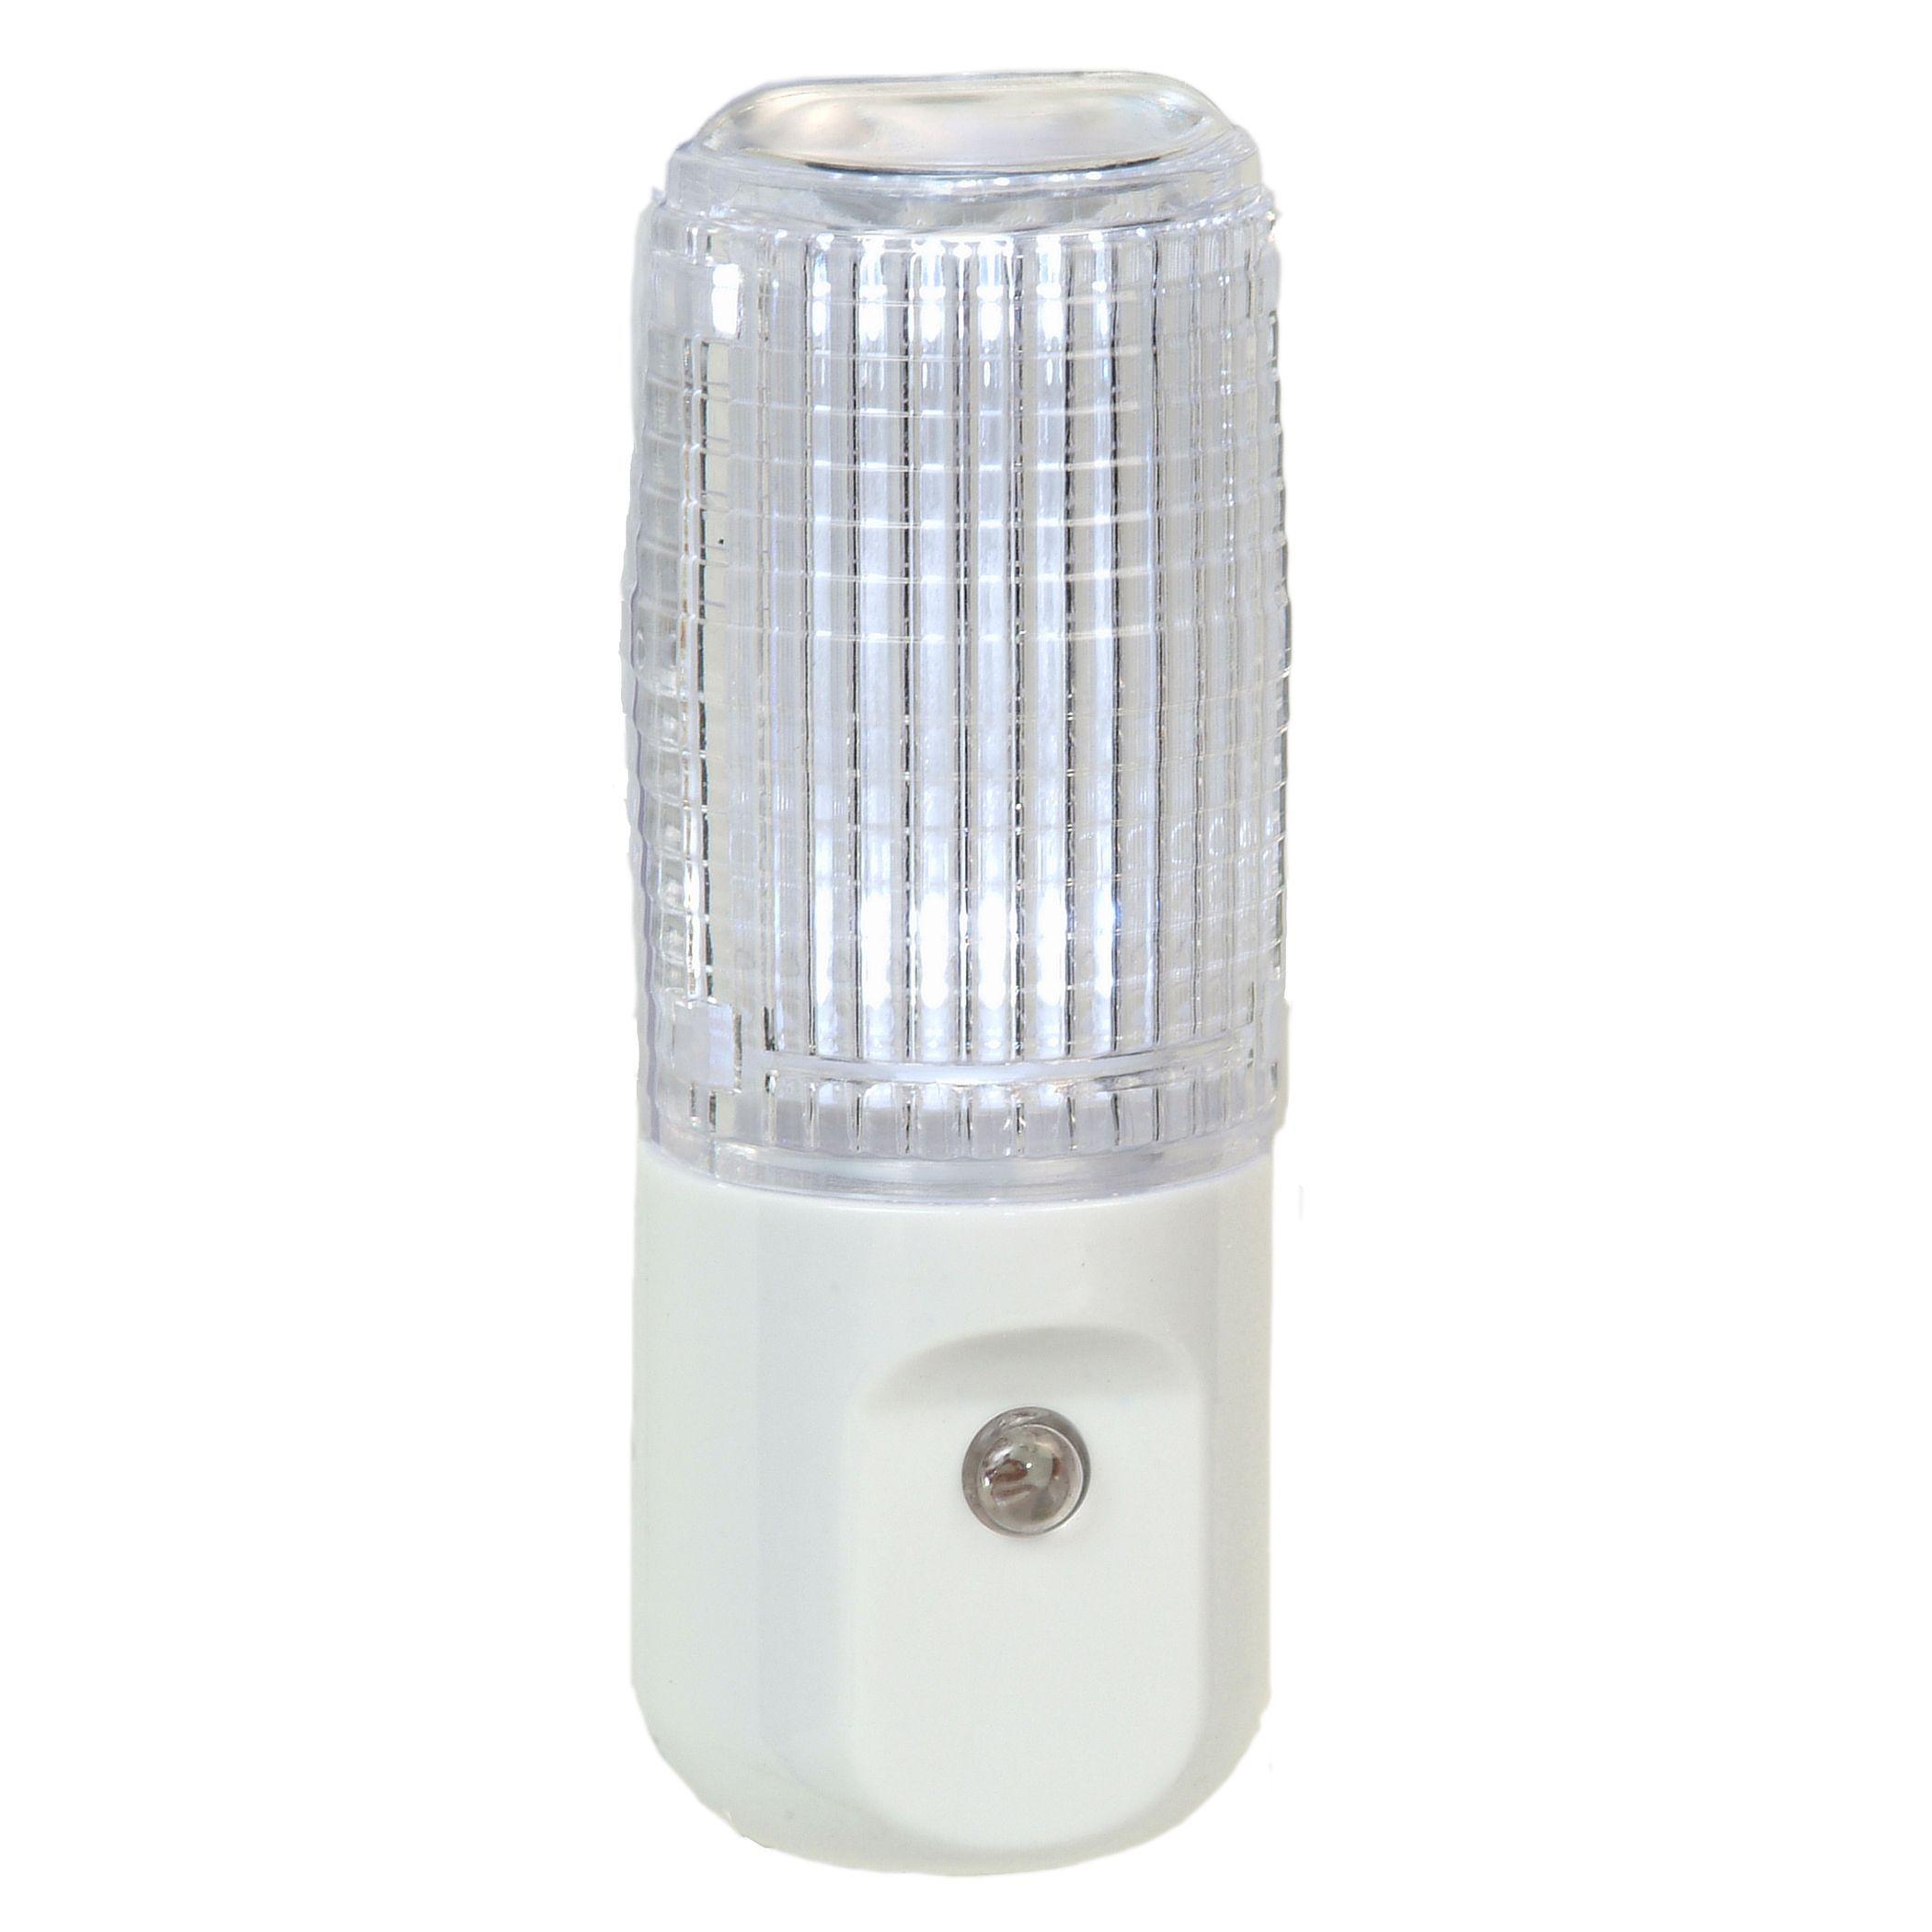 Amertac 71107cc 4875 x 1375 x 2 white clear lens led night light amertac 71107cc 4875 x 1375 x 2 white clear lens led night light arubaitofo Choice Image